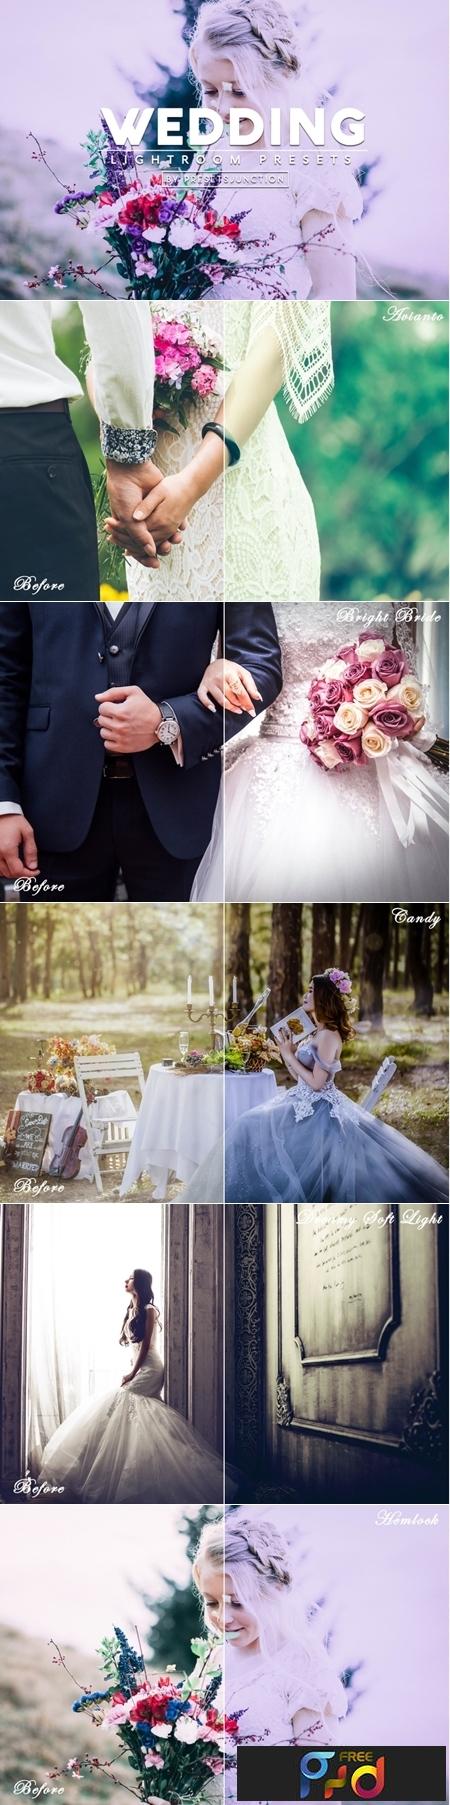 Wedding Lightroom Presets 1